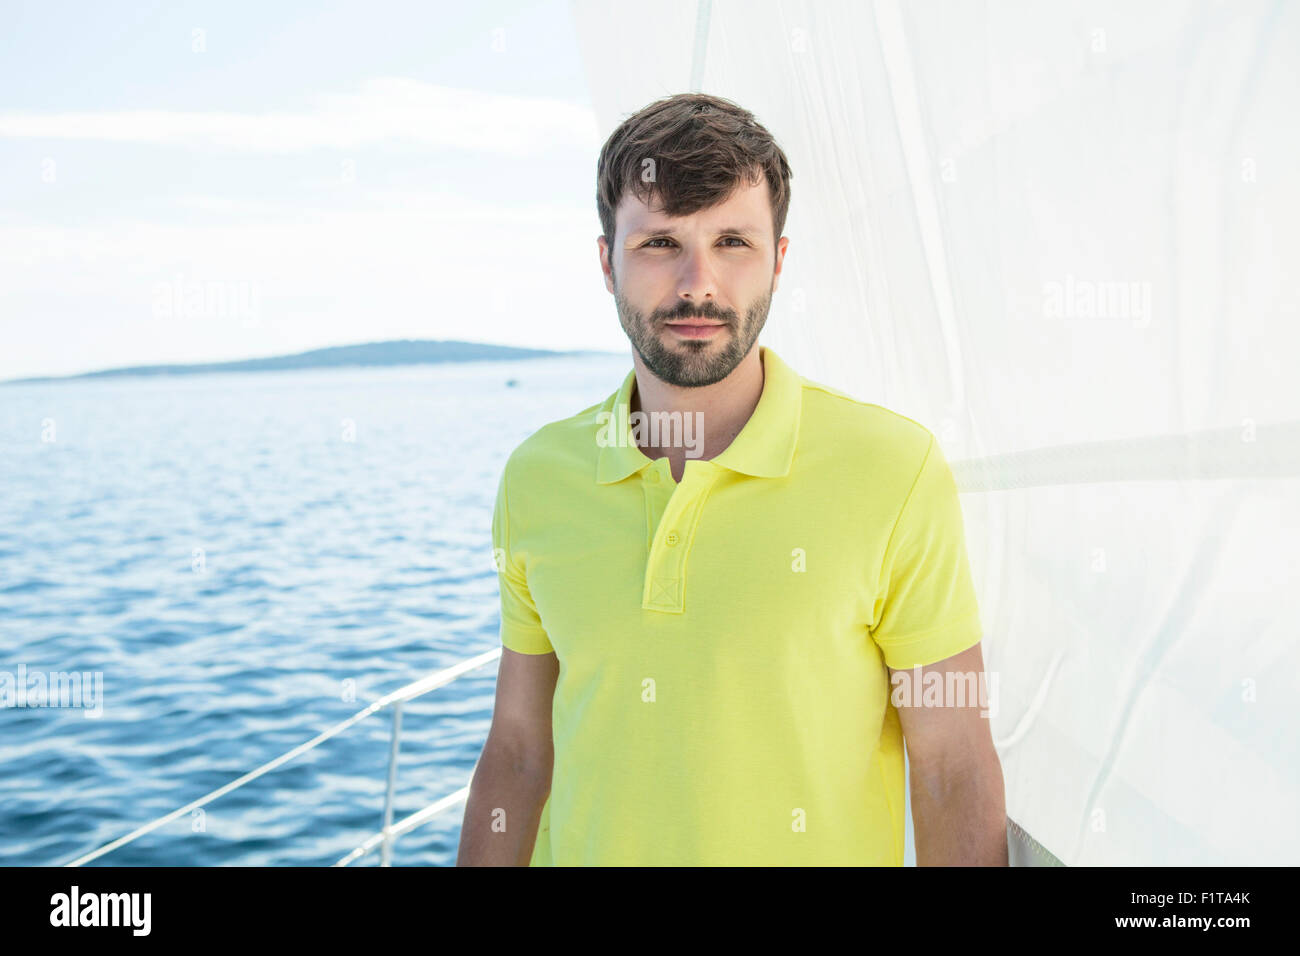 Portrait of man on sailboat, Adriatic Sea - Stock Image